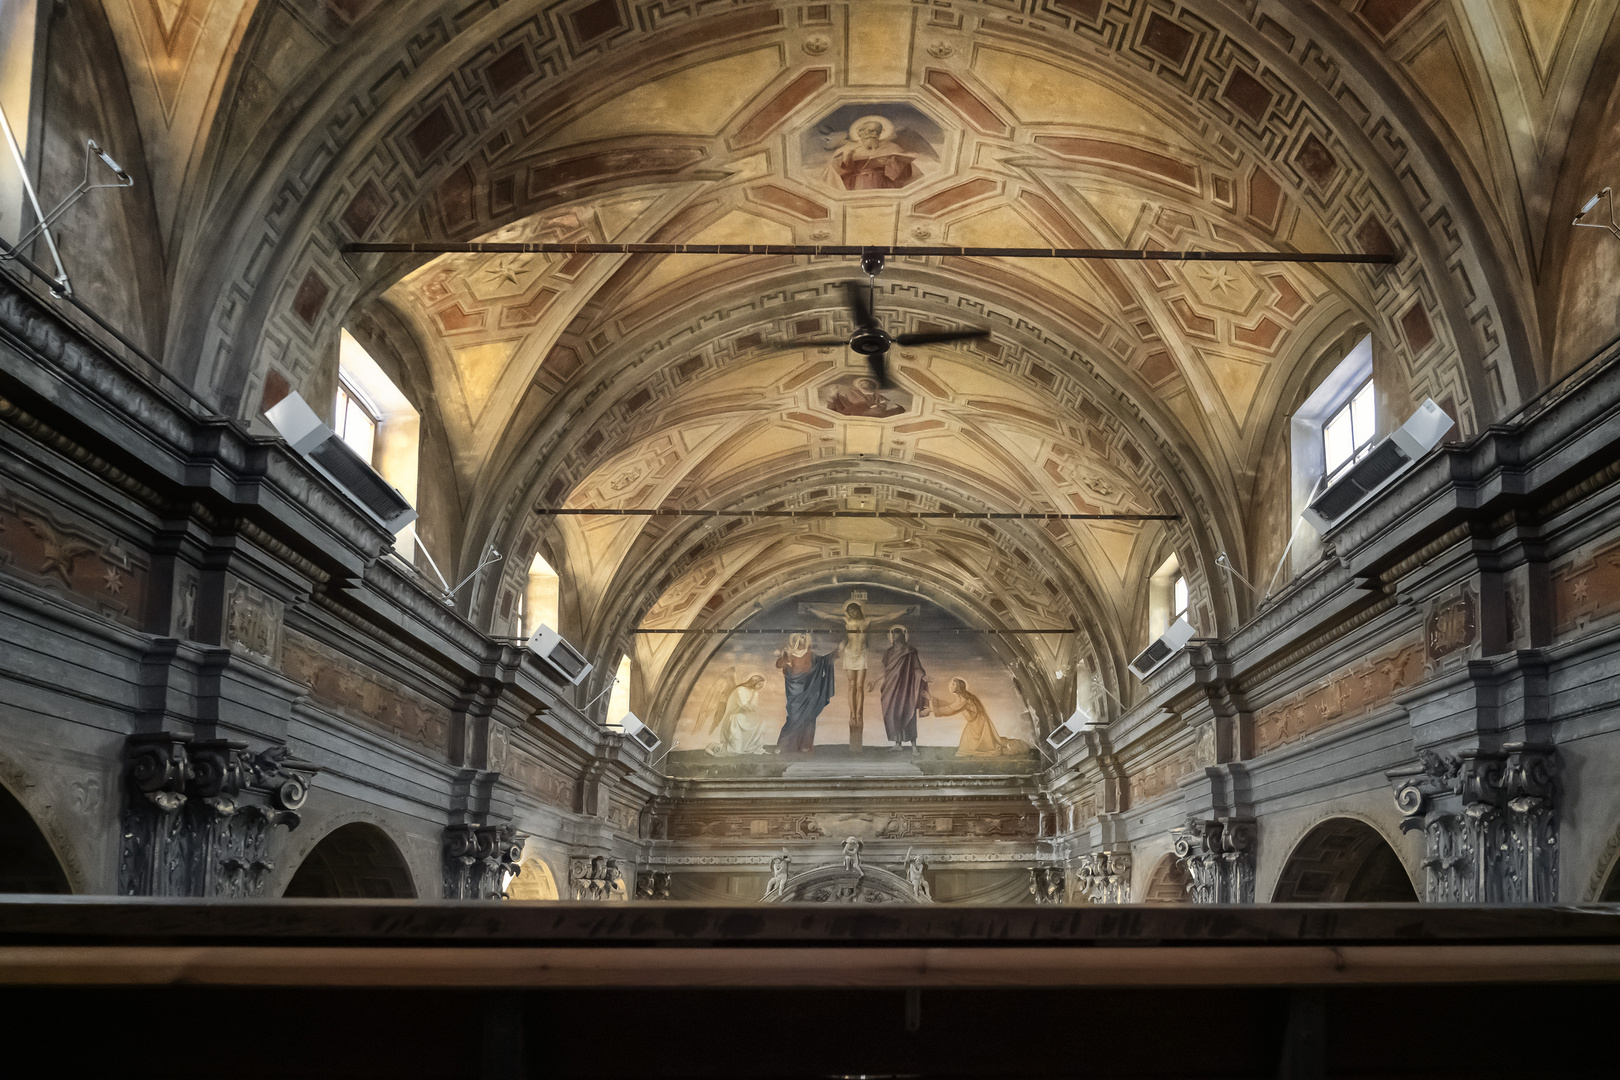 Chiesa Ss. Pietro e Paolo, Castelveccana